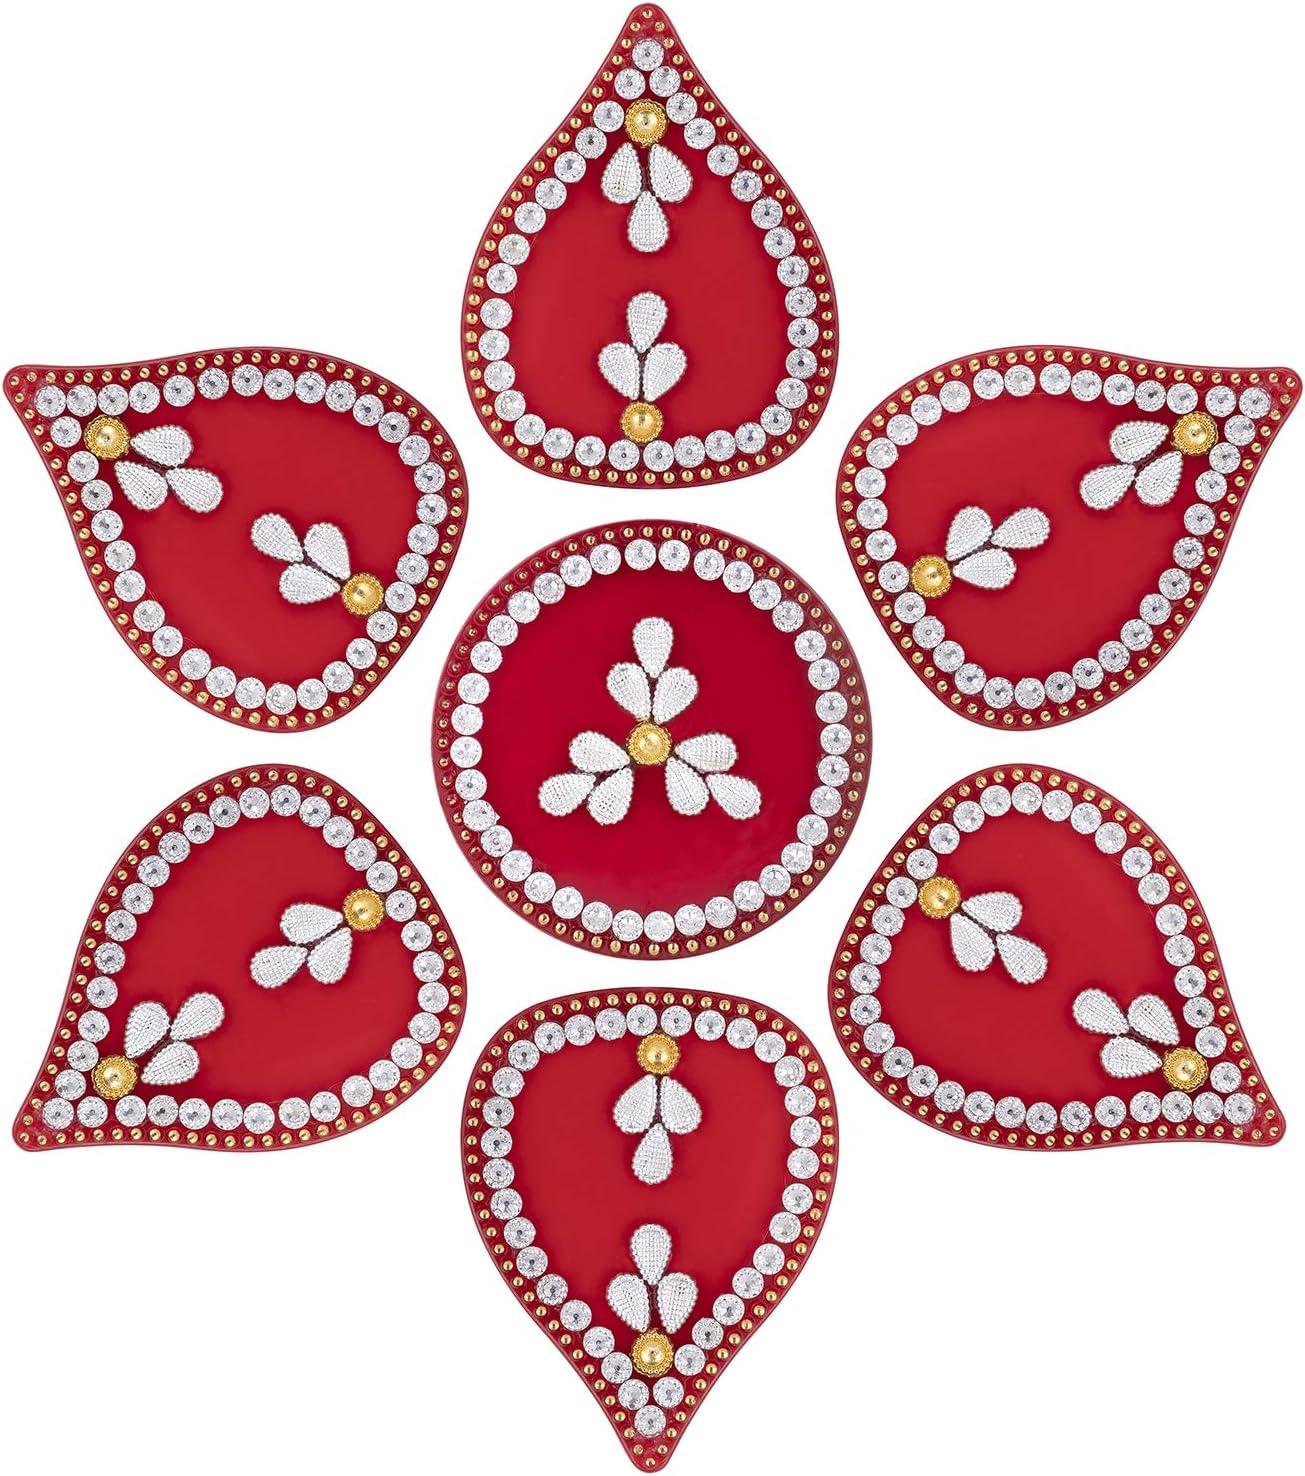 Aheli Acrylic Modak Design Stone Studded Diwali Party Rangoli Floor Table Door Decorations Indian Traditional Home Office Decor